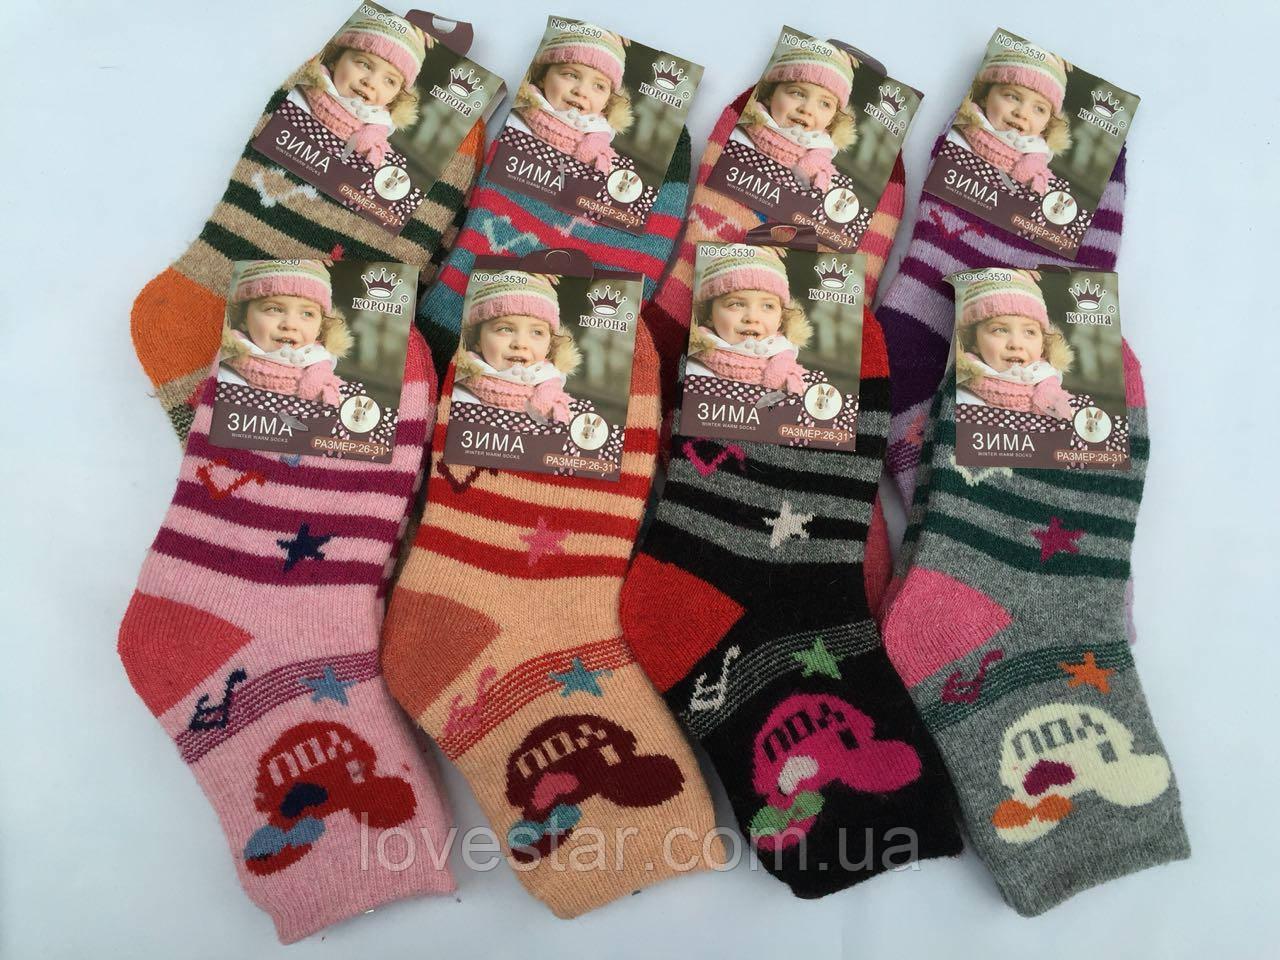 Шерстяные носки Ангора корона 26-31 (C3533)